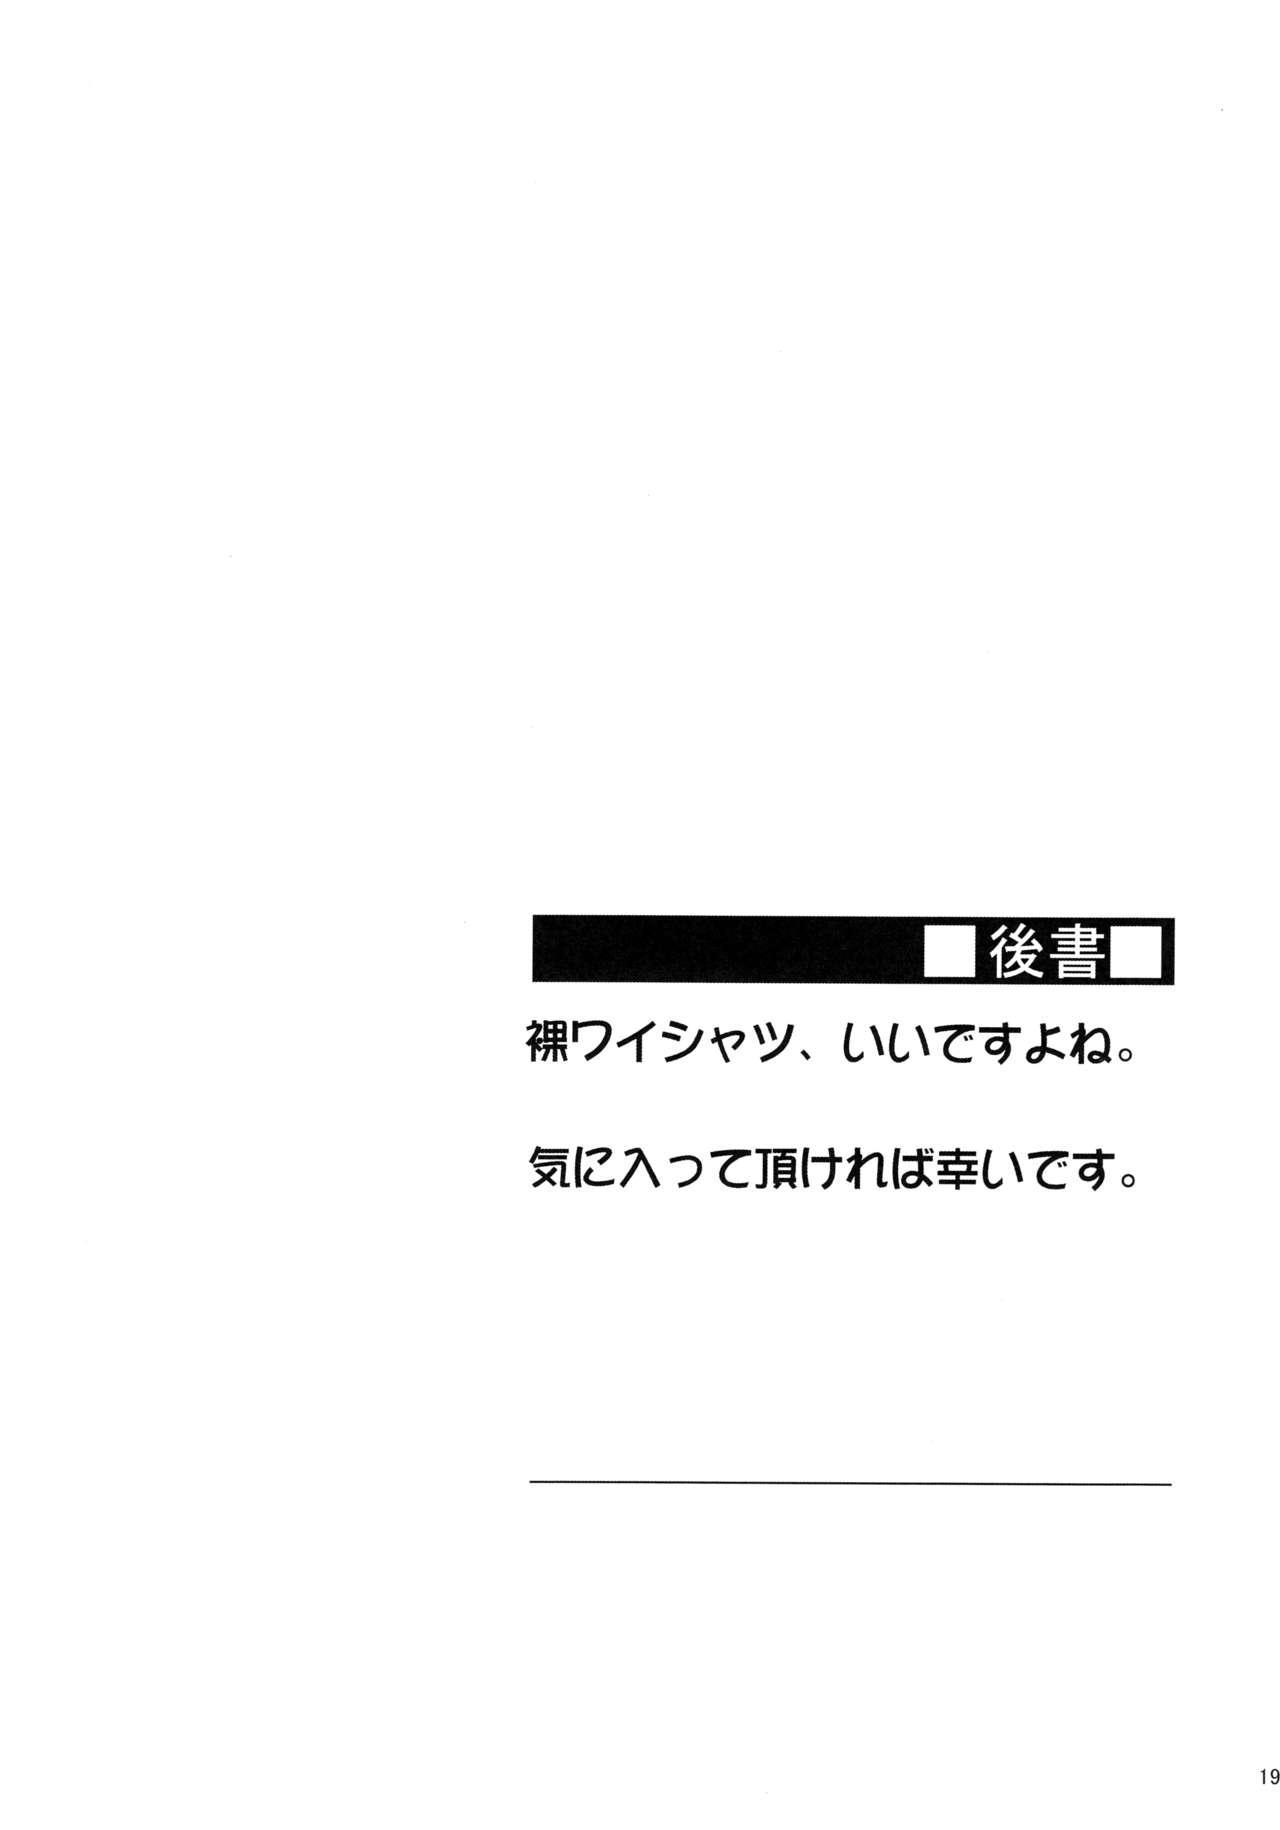 Rider-san to Hadawai. 19